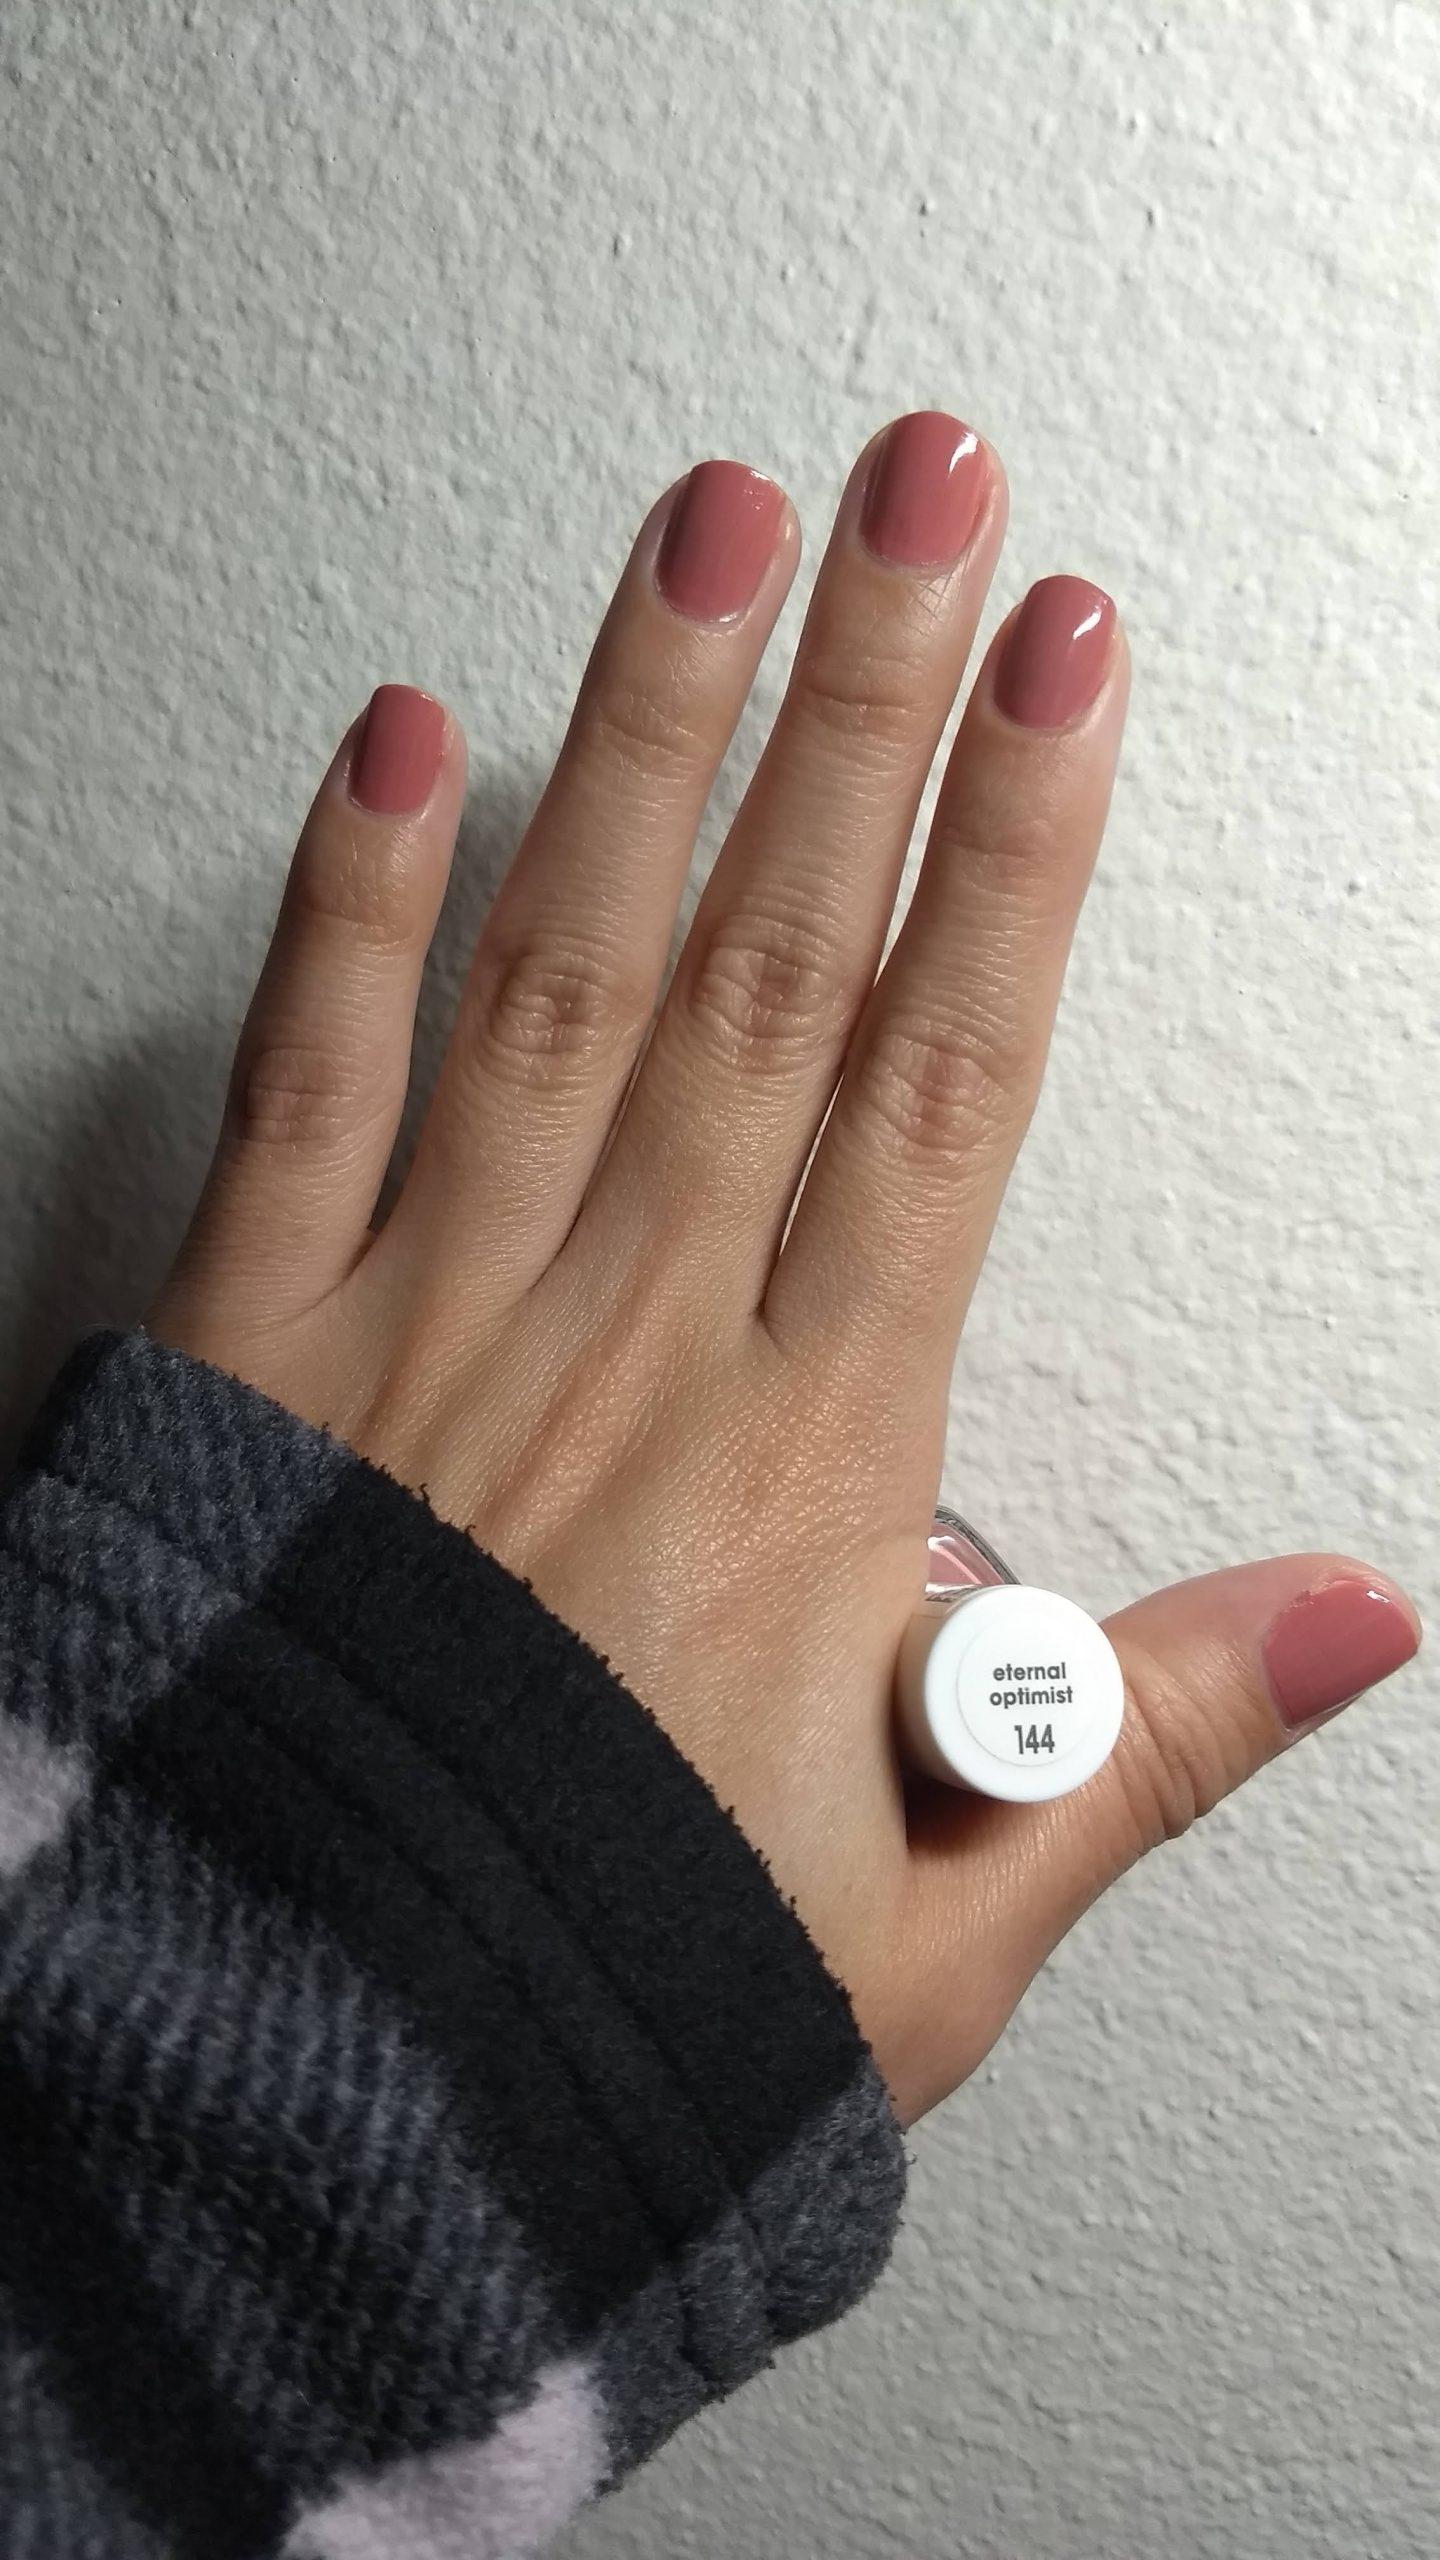 Nail Polish for Valentine's Day: Eternal Optimist by Essie